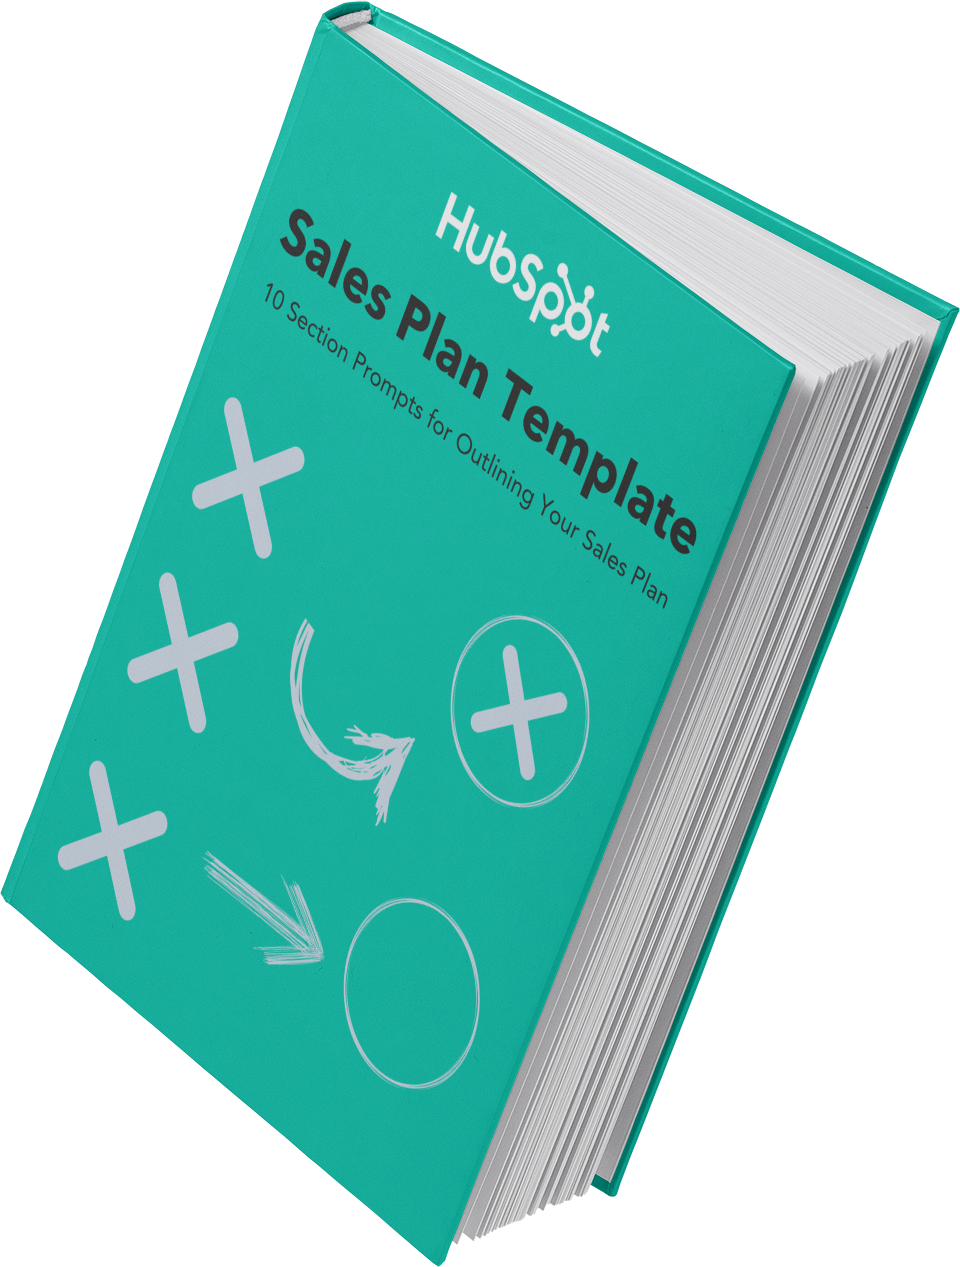 Free Sales Plan Template Hubspot